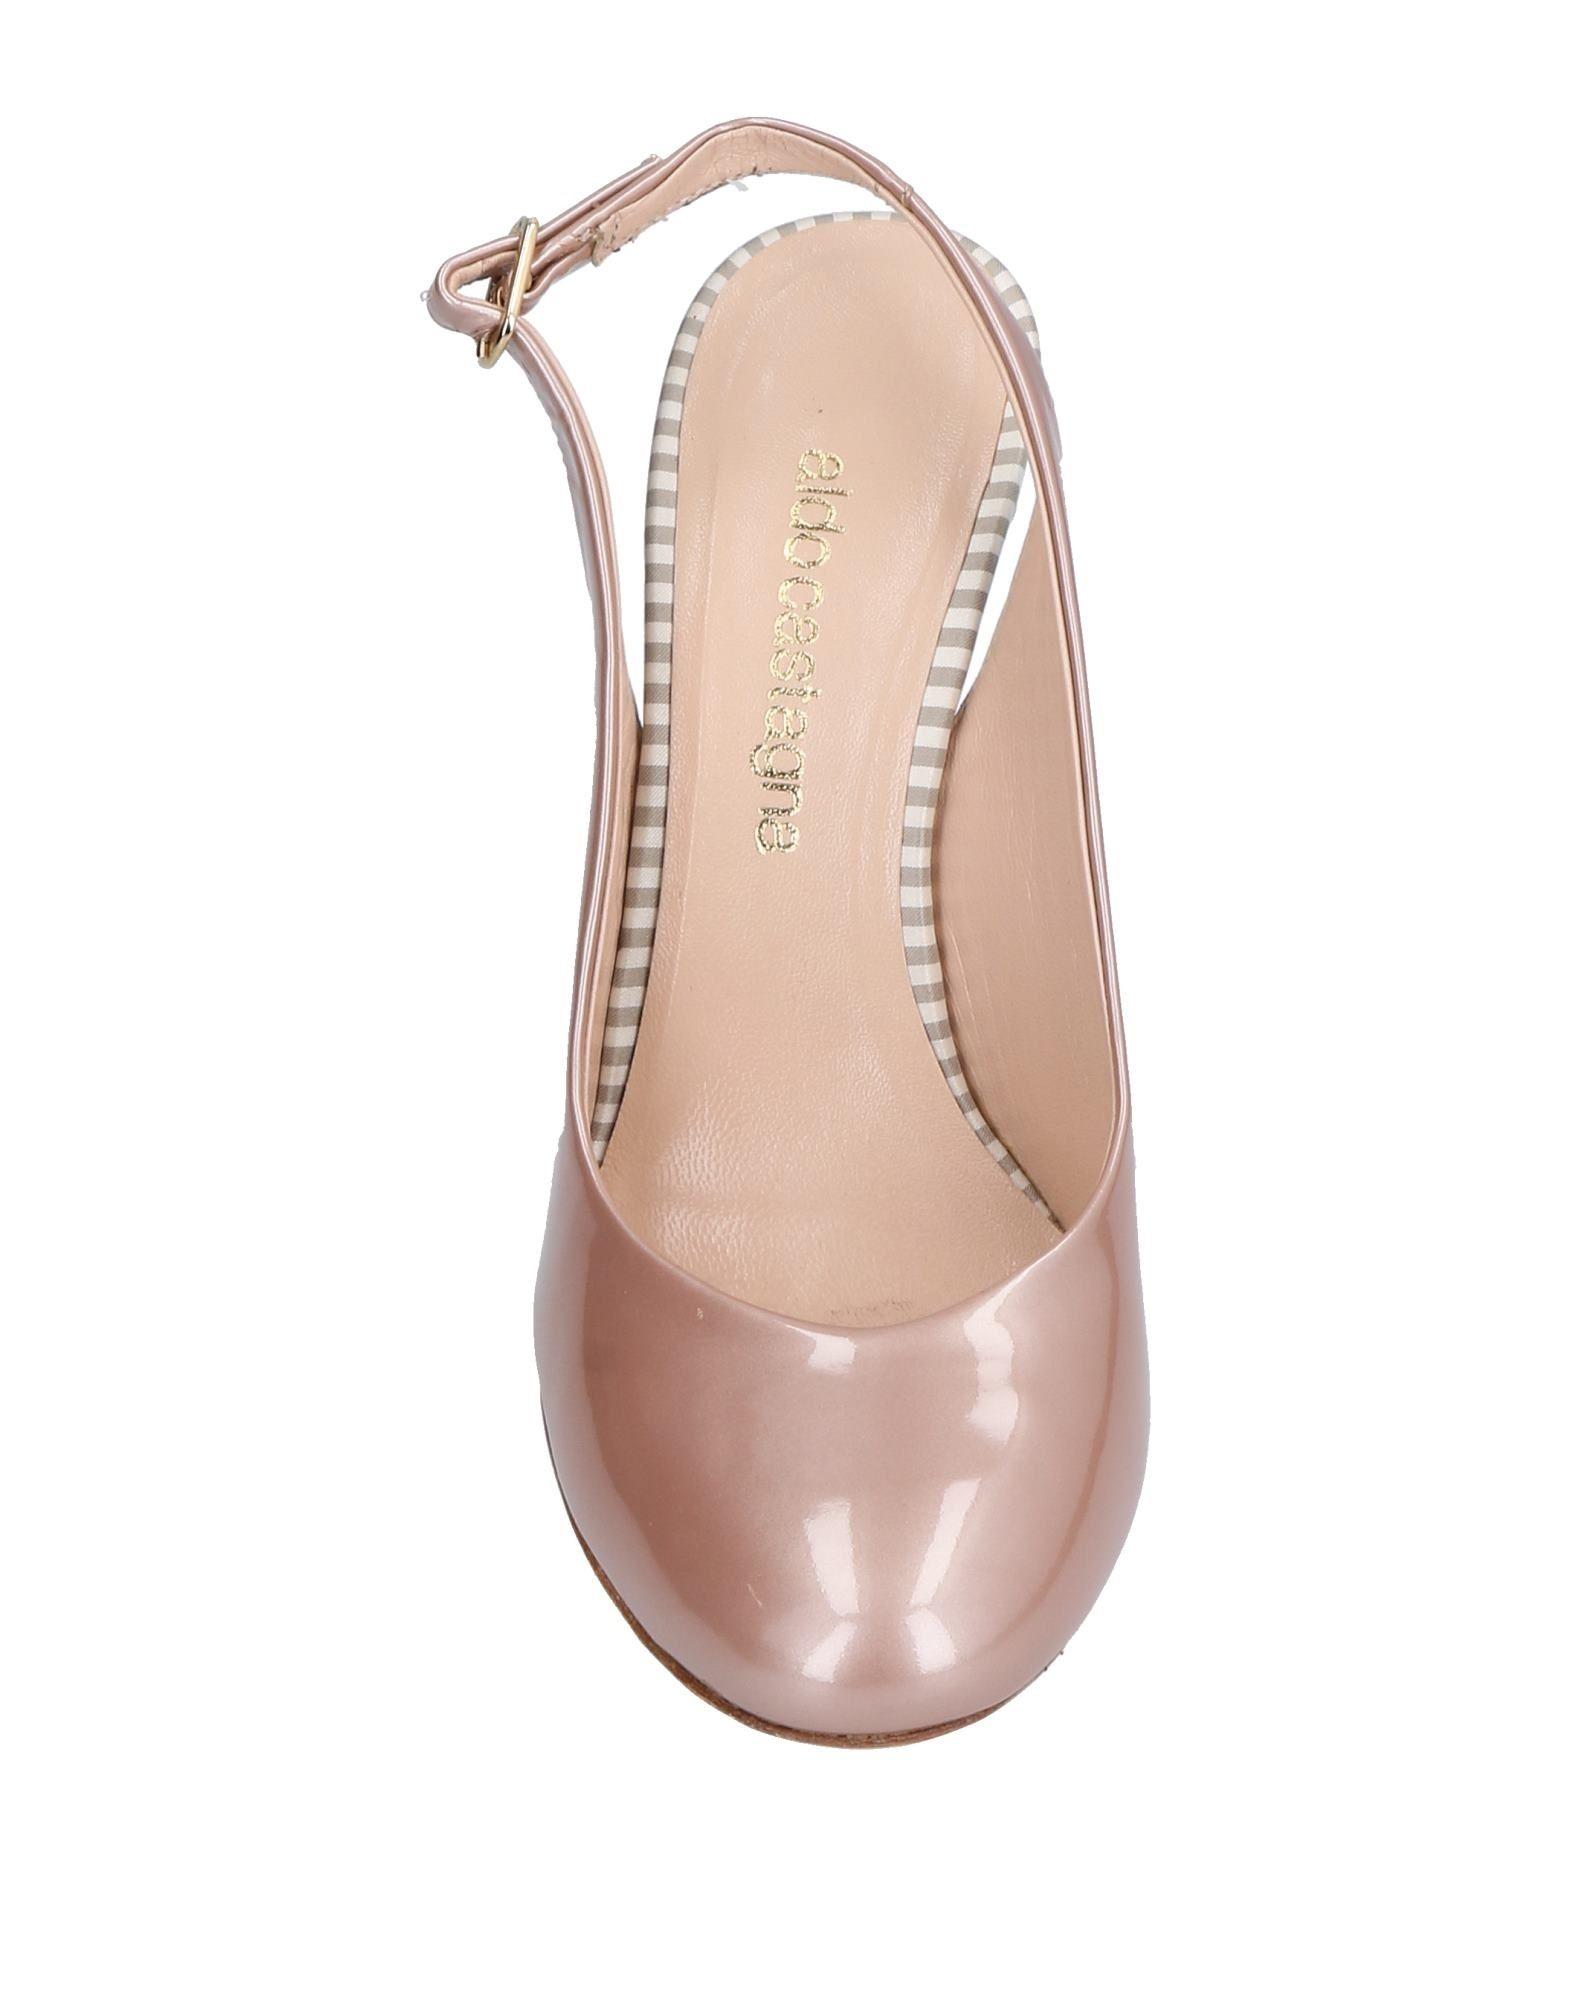 Aldo Castagna Pumps Damen  11513768RJ Gute Qualität beliebte Schuhe